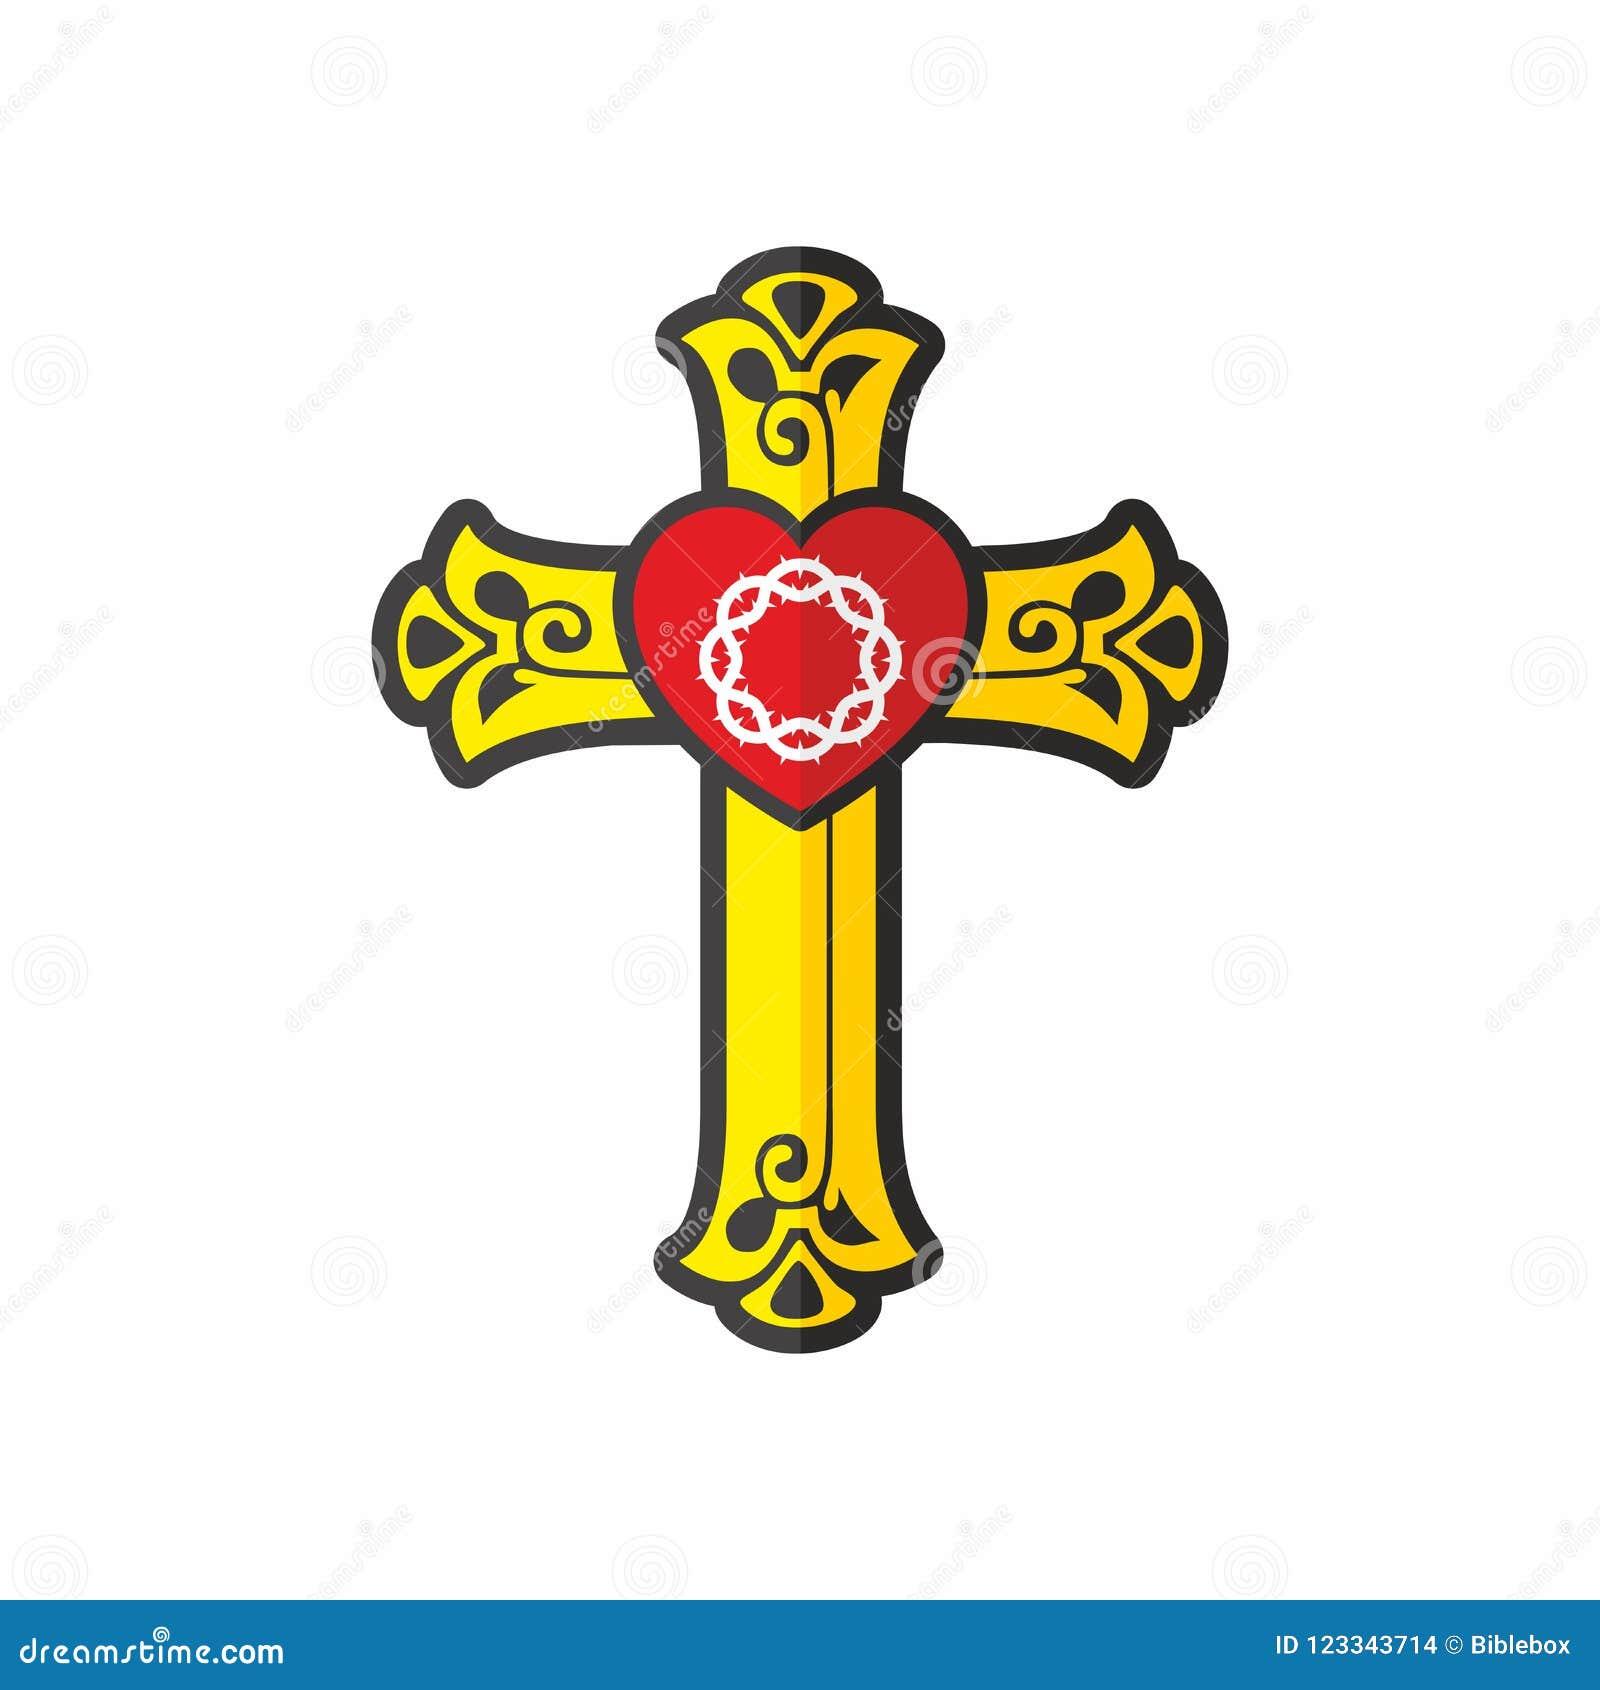 Christian Church Logo Cross Heart And Crown Of Thorns Stock Vector